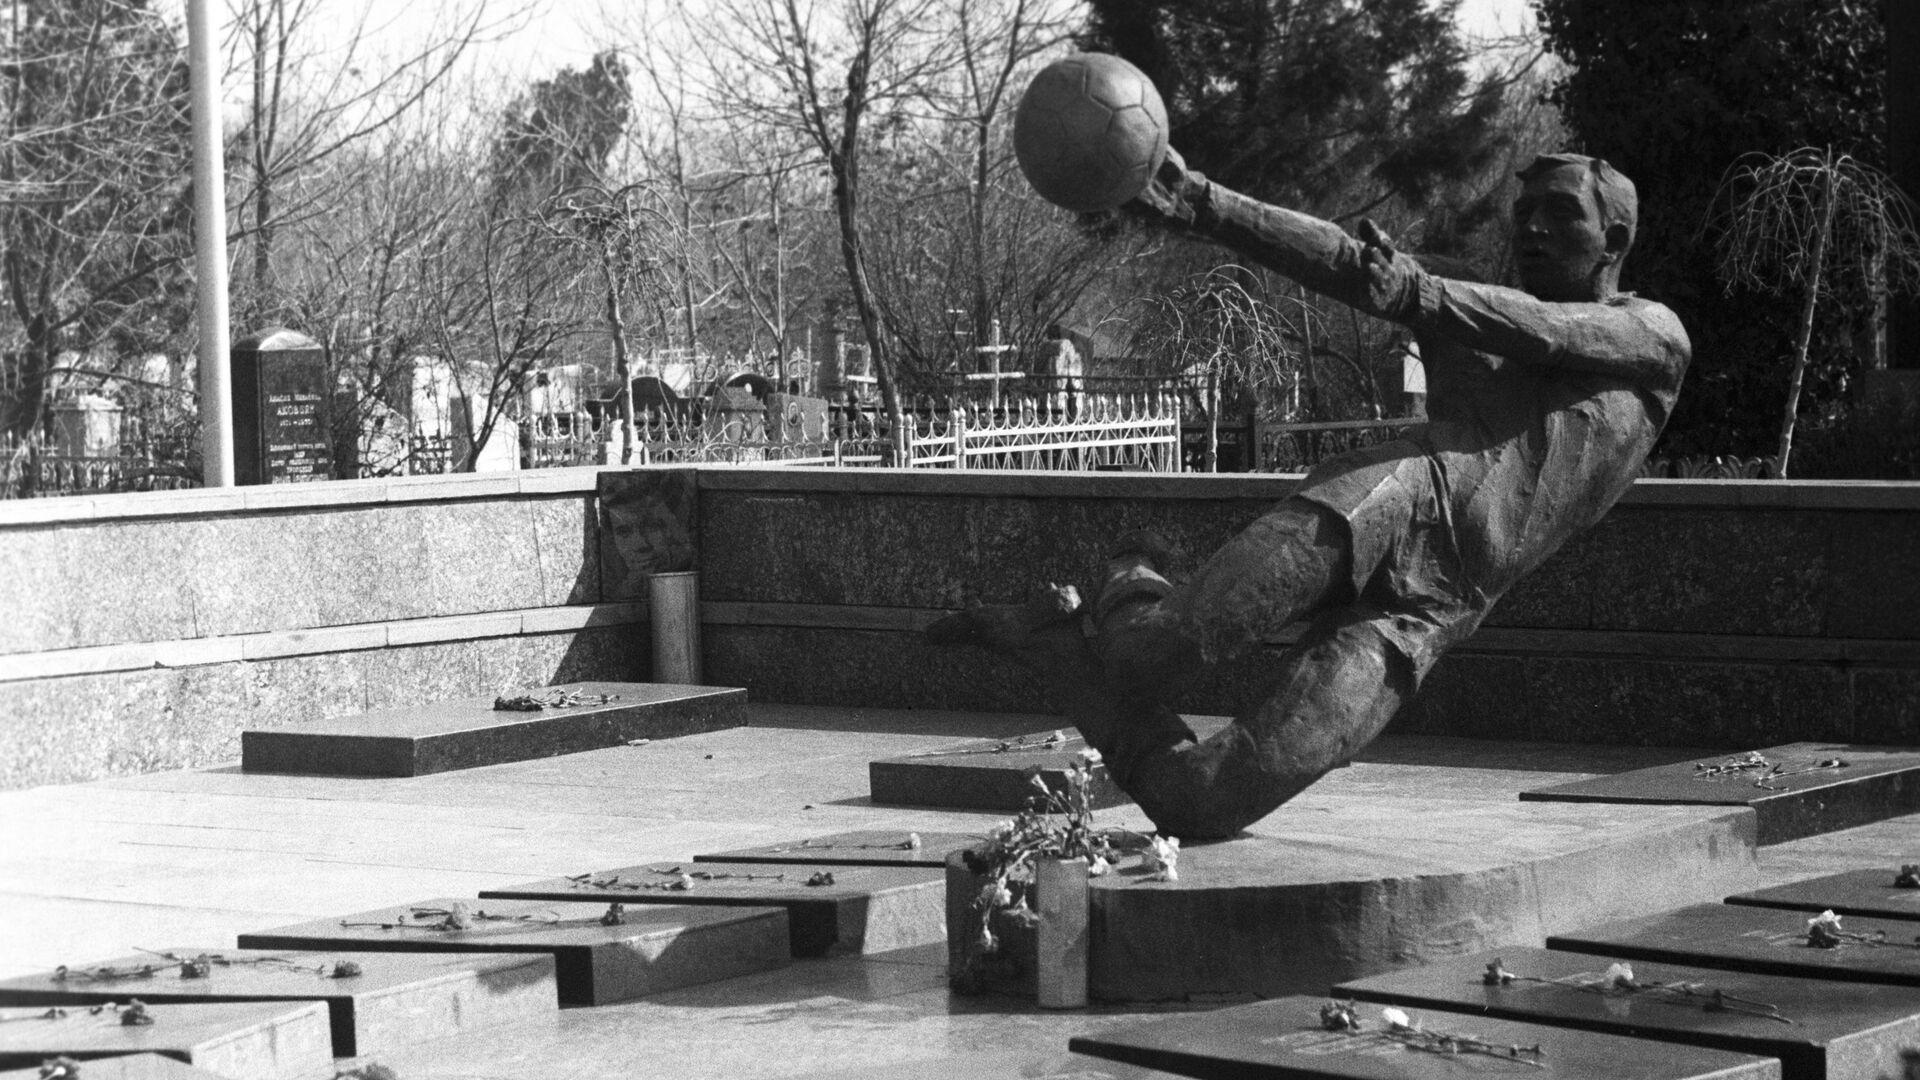 Памятник игрокам Пахтакора в Ташкенте - Sputnik Узбекистан, 1920, 11.08.2021